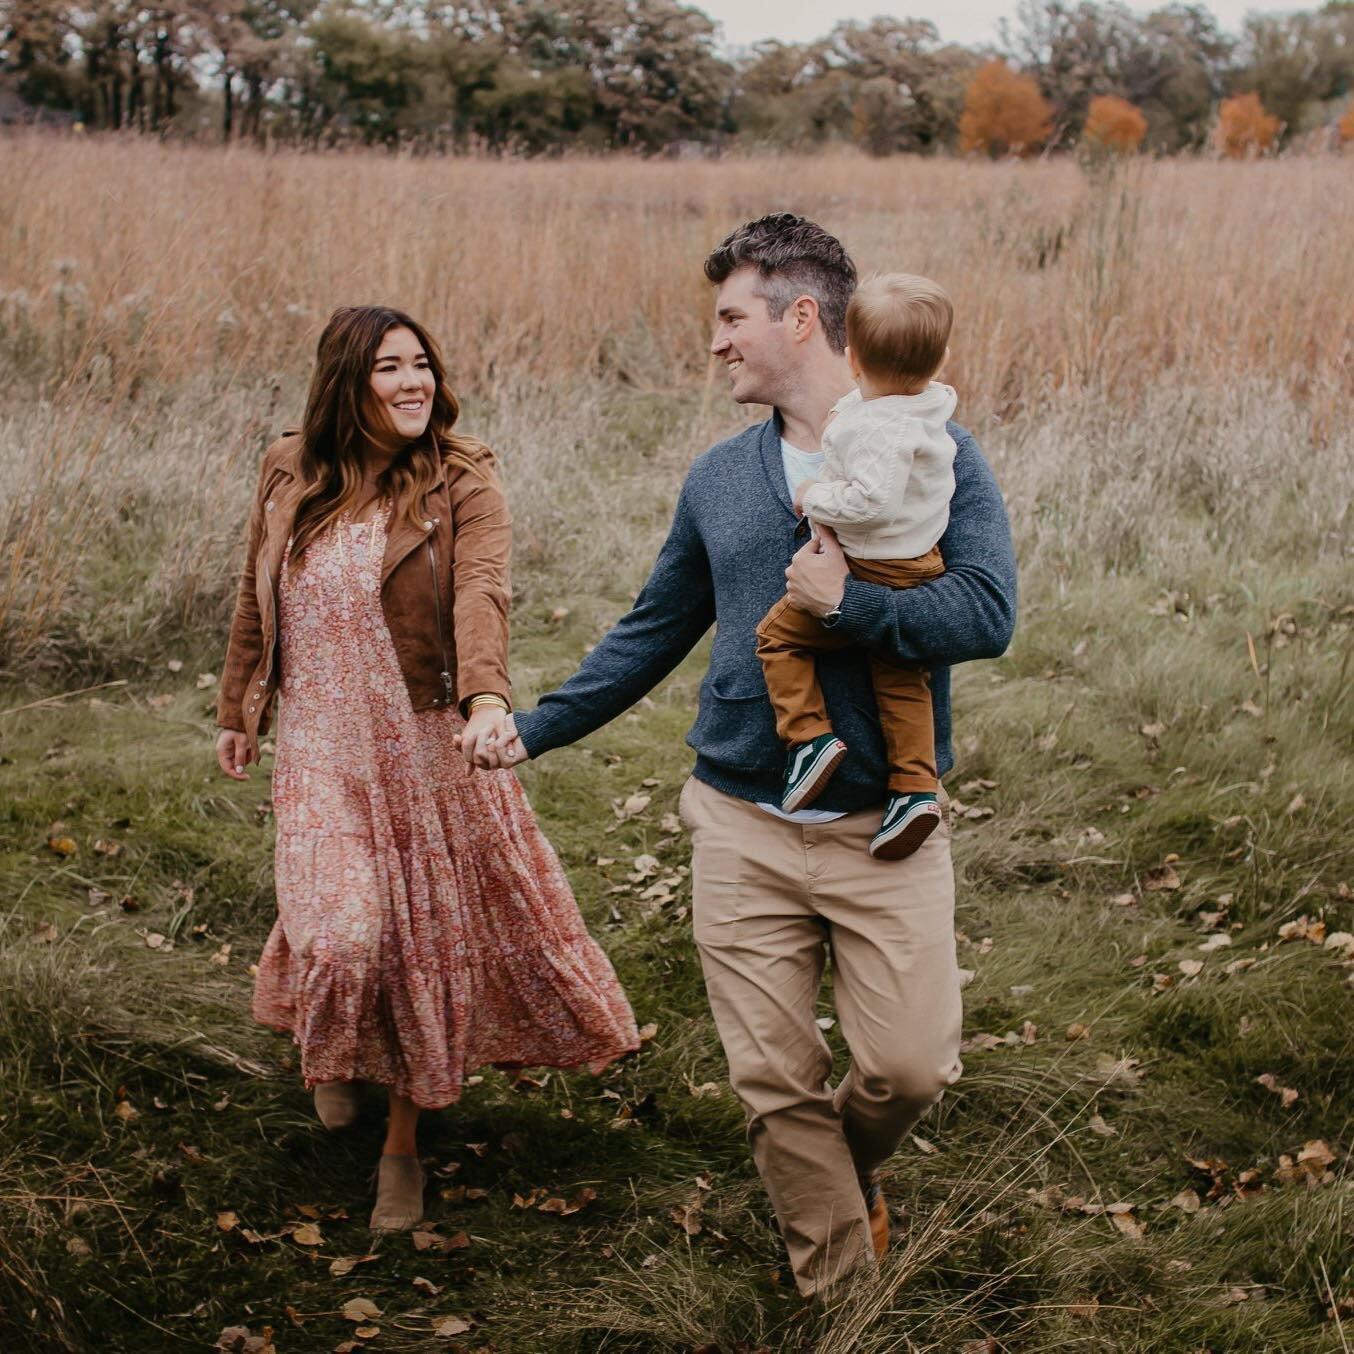 Fall Family Photo Free People Dress Photo